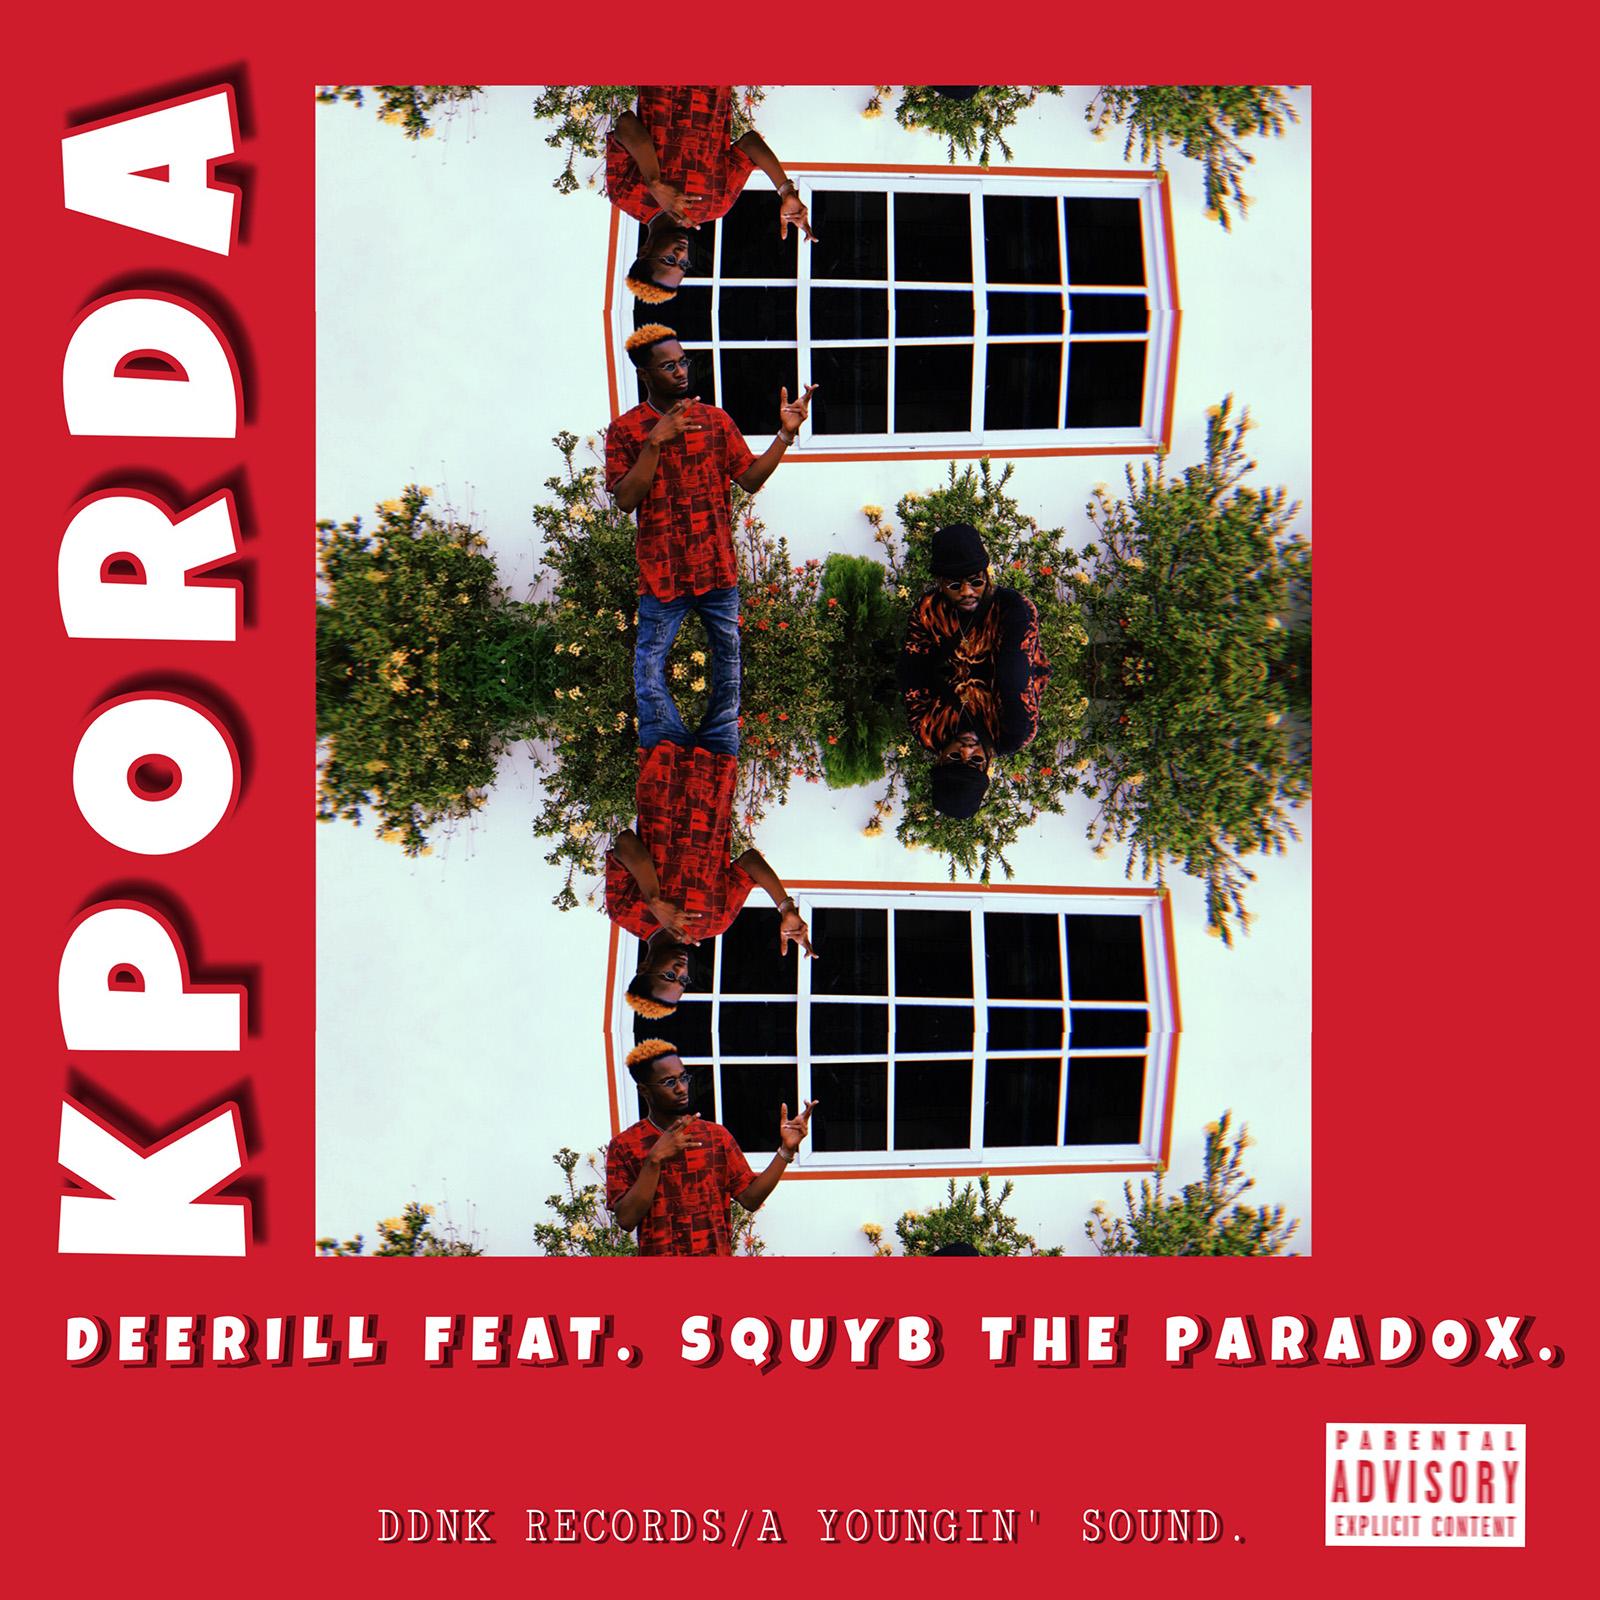 Kporda by Deerill feat. SquYb the Paradox